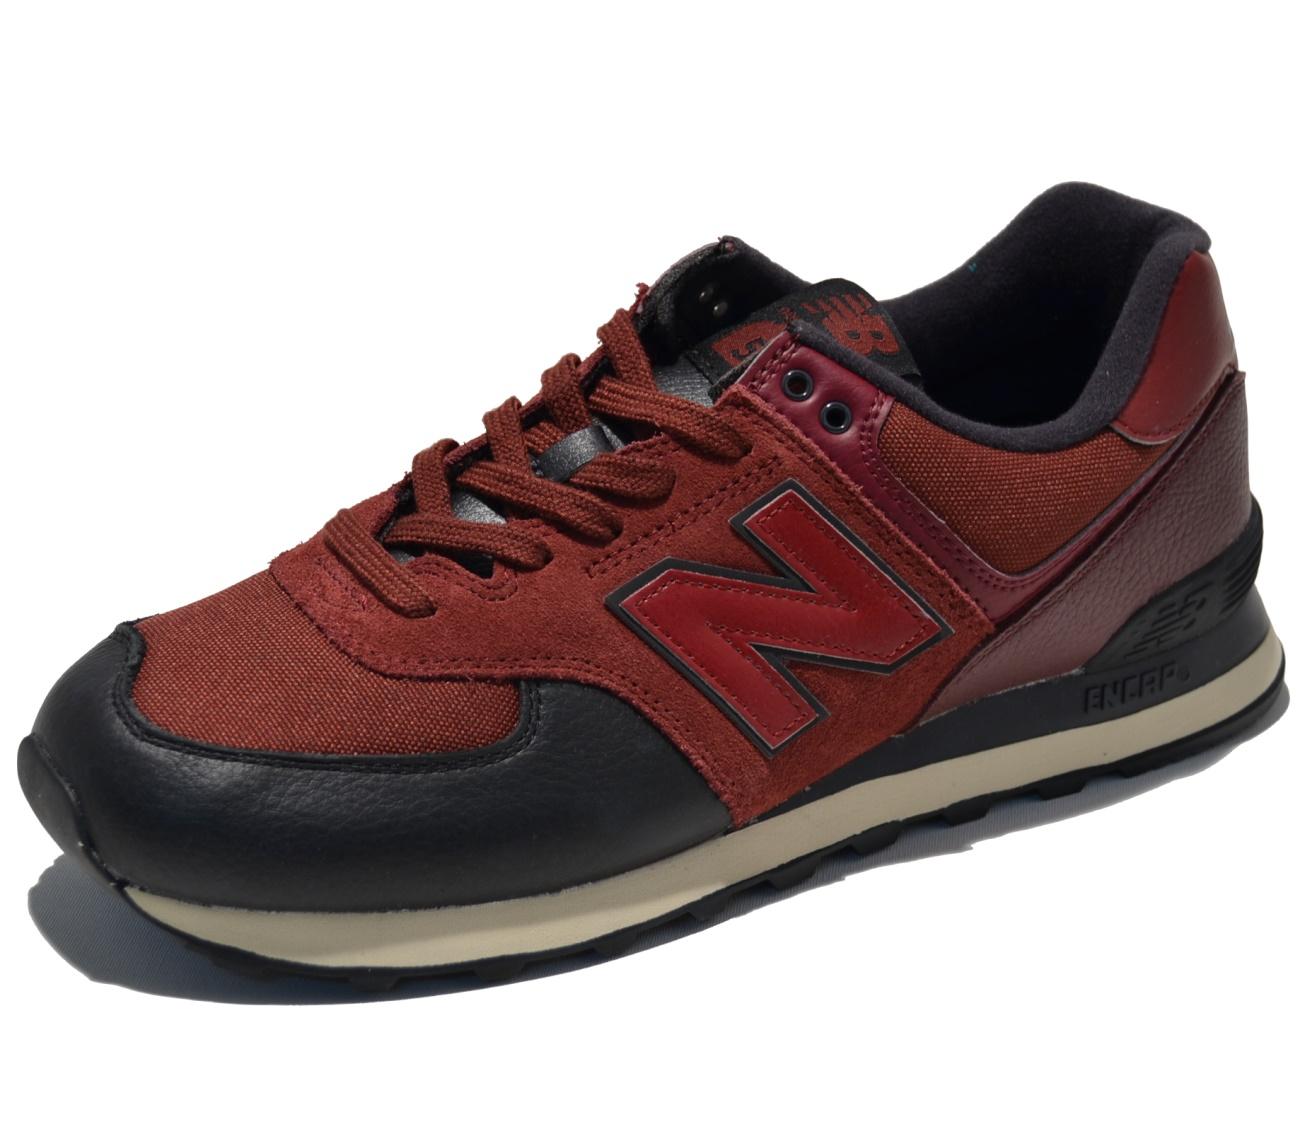 New Balance Laufschuhe ML574LHB New Balance bei Rascal Streetwear